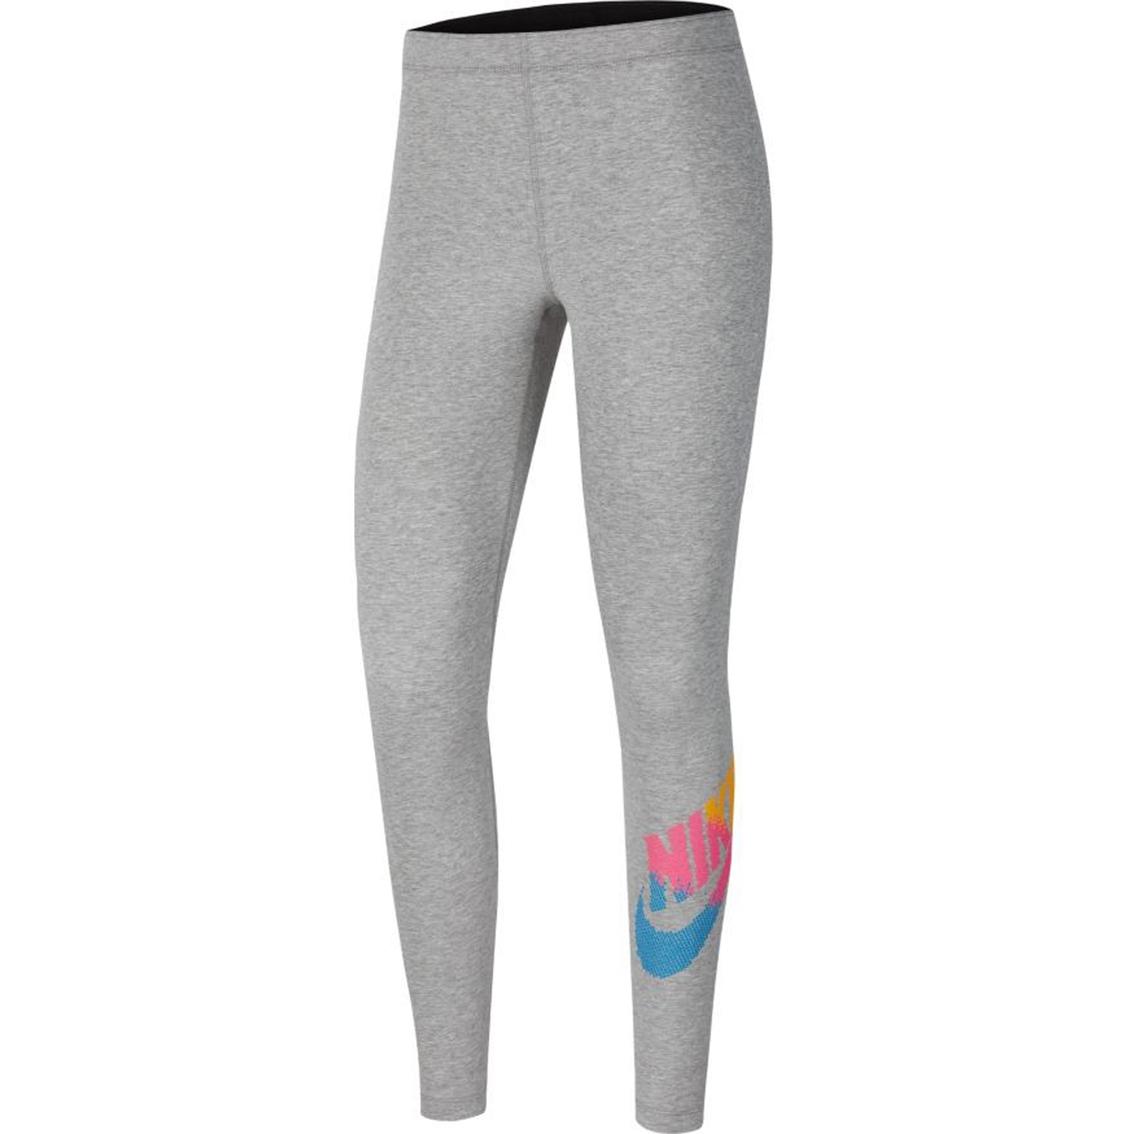 interior construir efecto  Nike Hyper Flora Femme Club Leggings | Leggings | Clothing | Shop ...